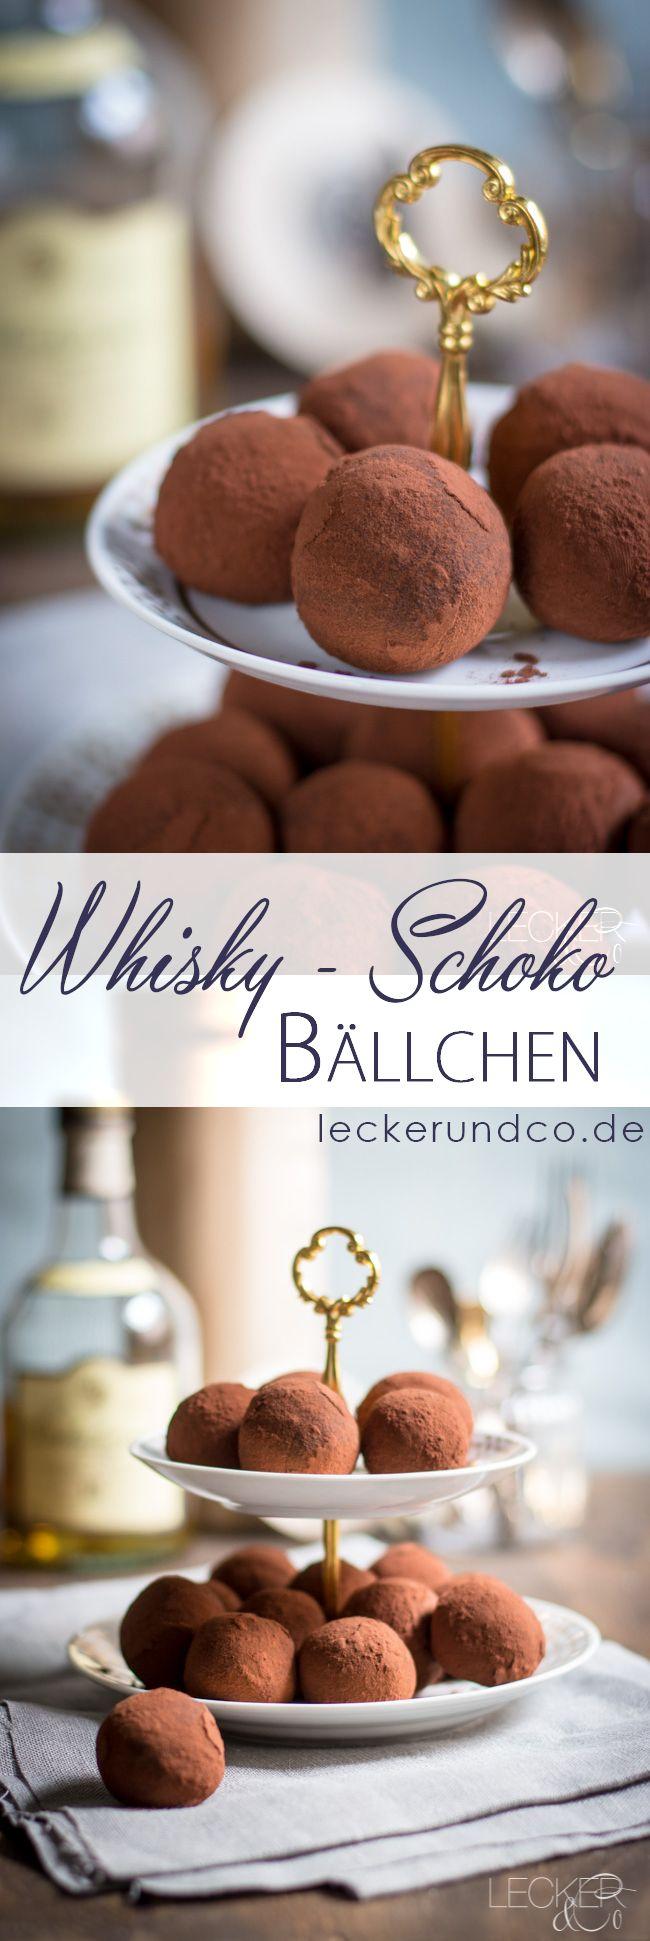 Whisky Schokoladen Bällchen